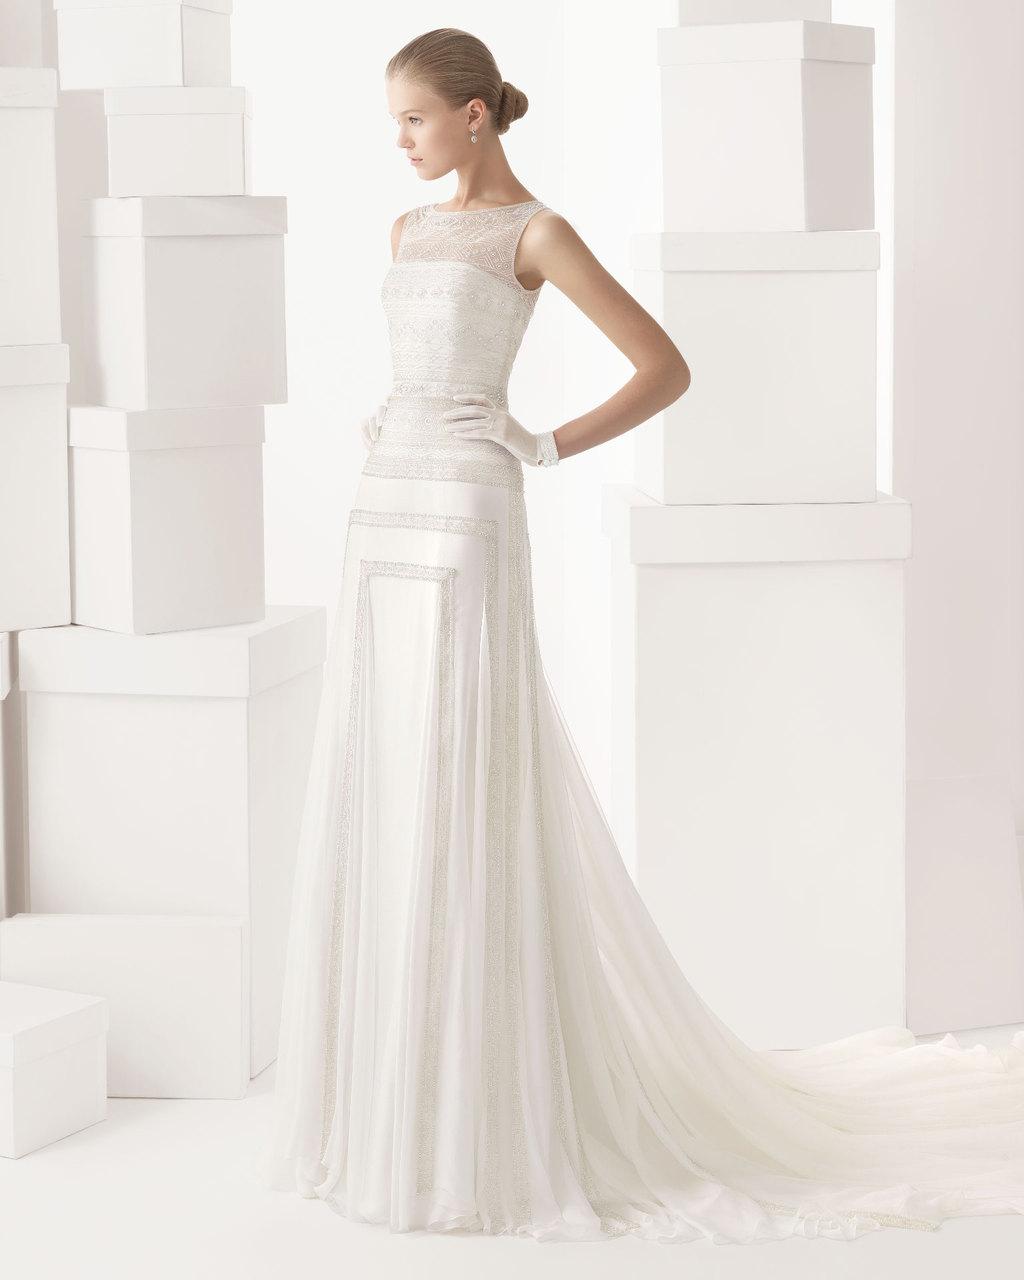 Rosa-clara-wedding-dress-2014-bridal-cintia.full